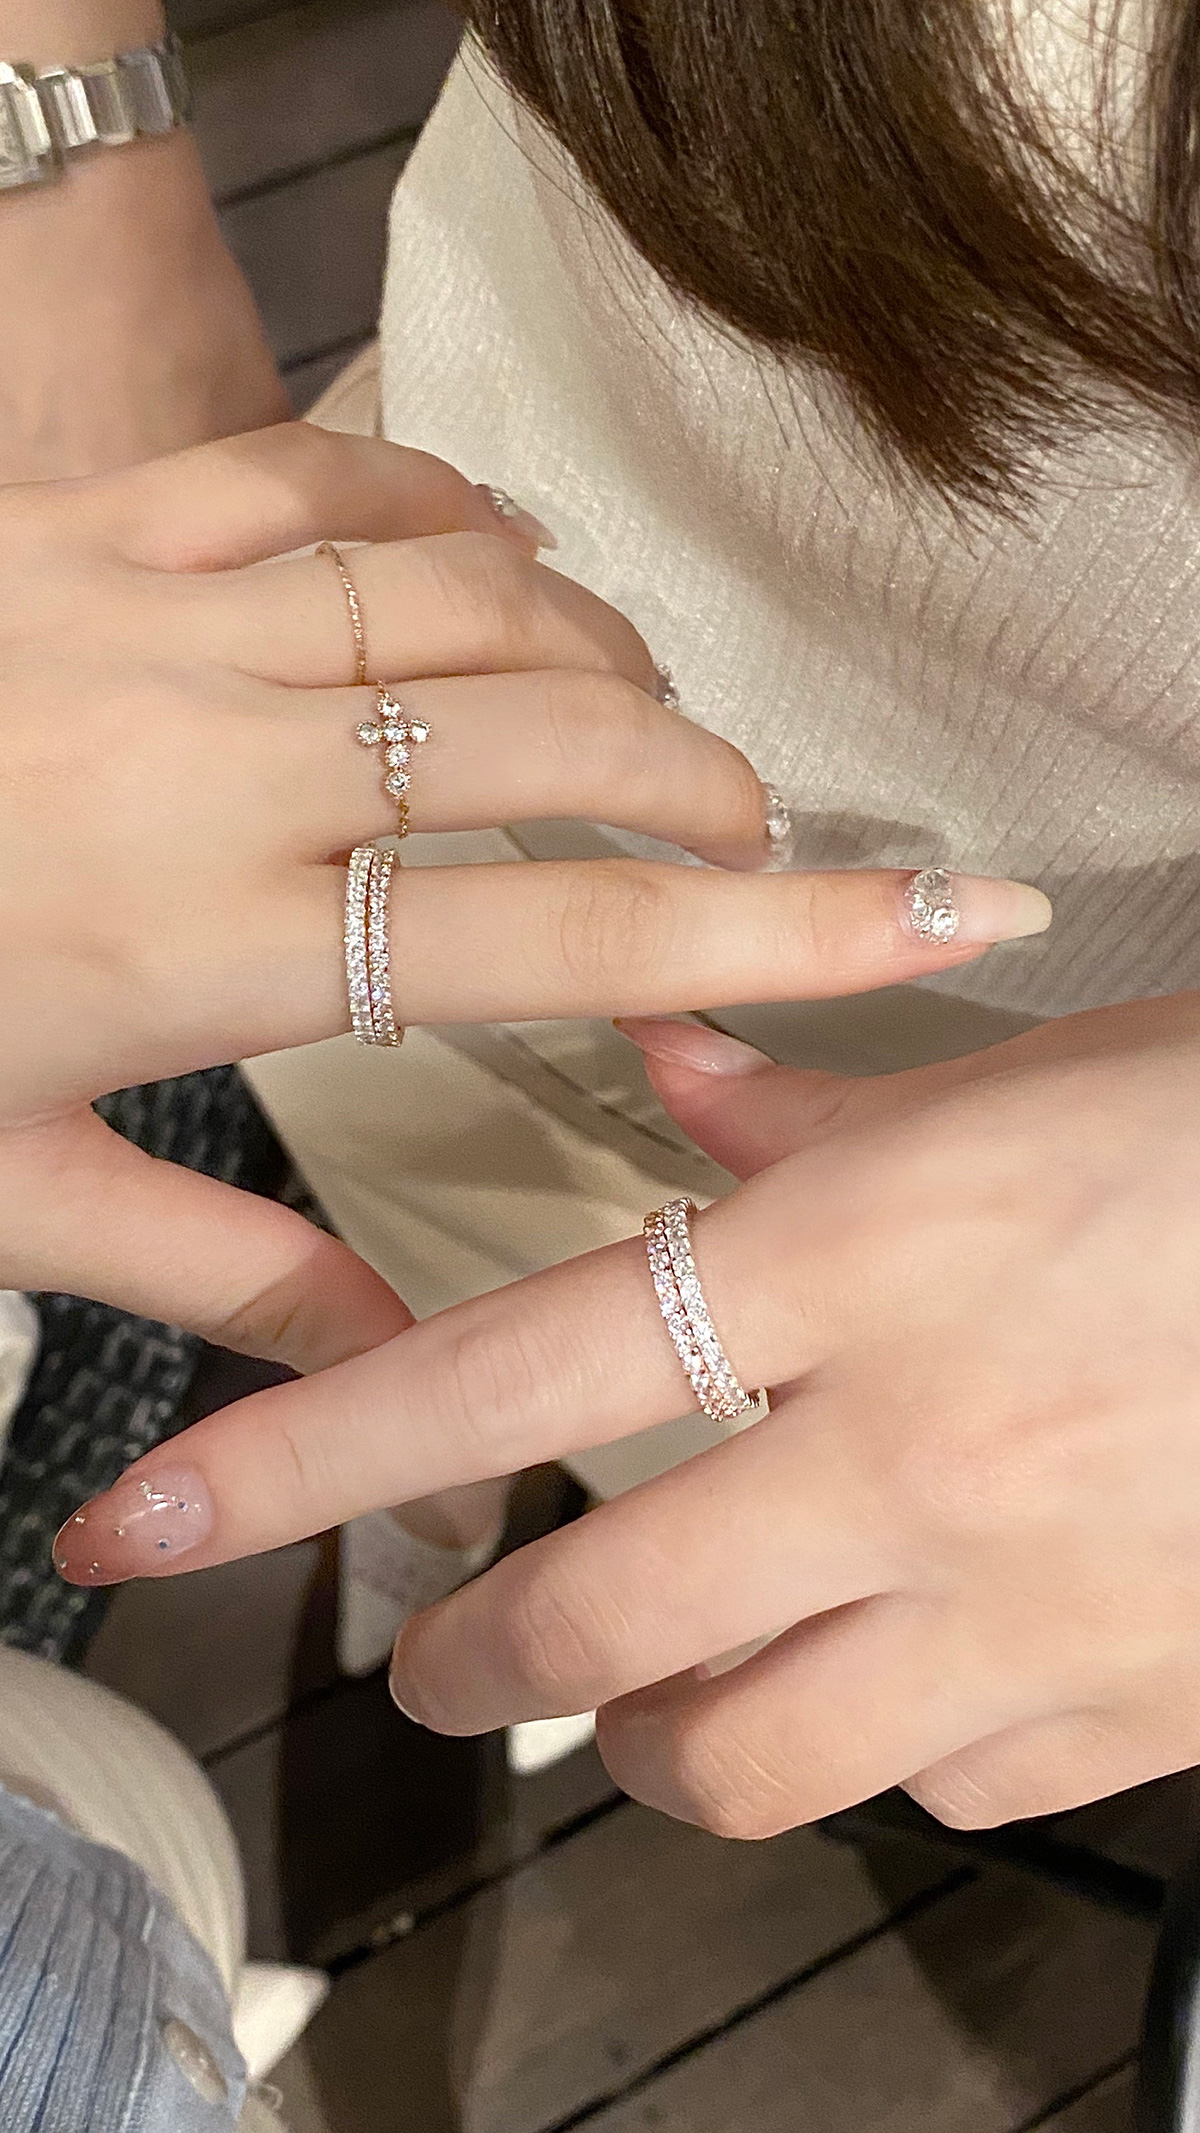 eternity Queen ring(silver925) カラー:シルバー、ピンクゴールド